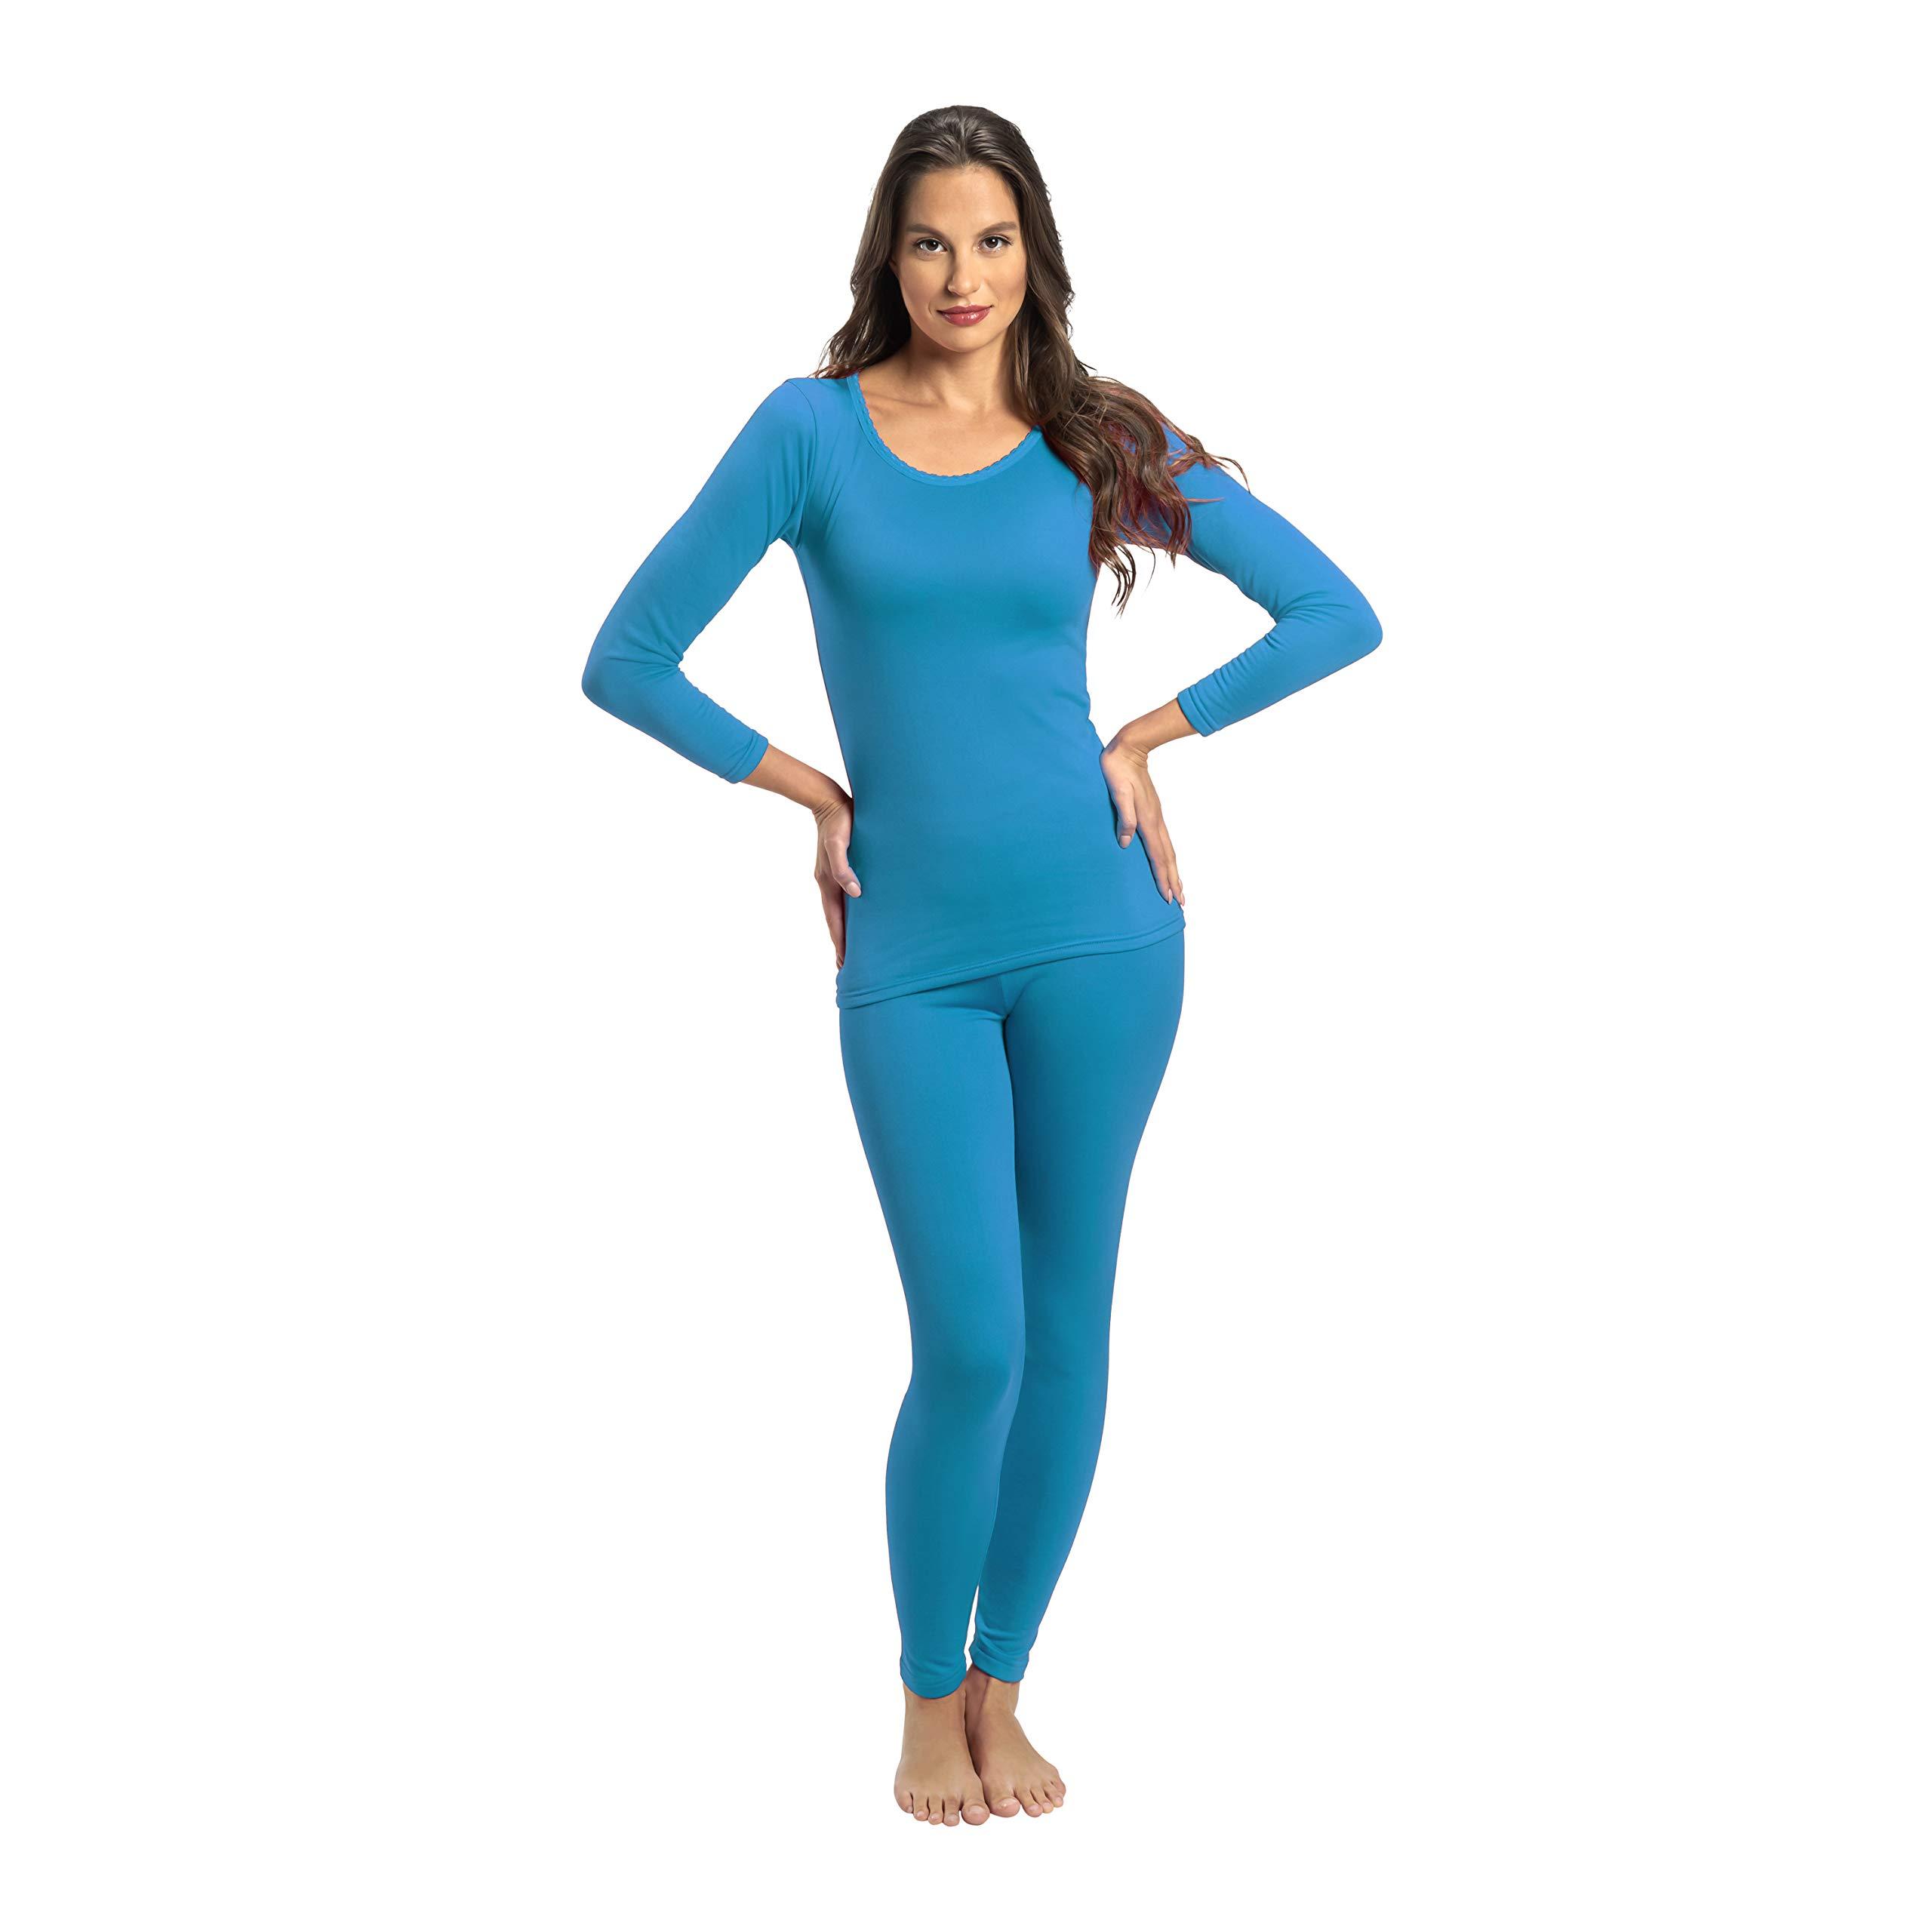 Rocky Women's 2 pc Ultra Soft Thermal Underwear, Top & Bottom Fleece Lined Long Johns (XLarge, Teal) by Rocky